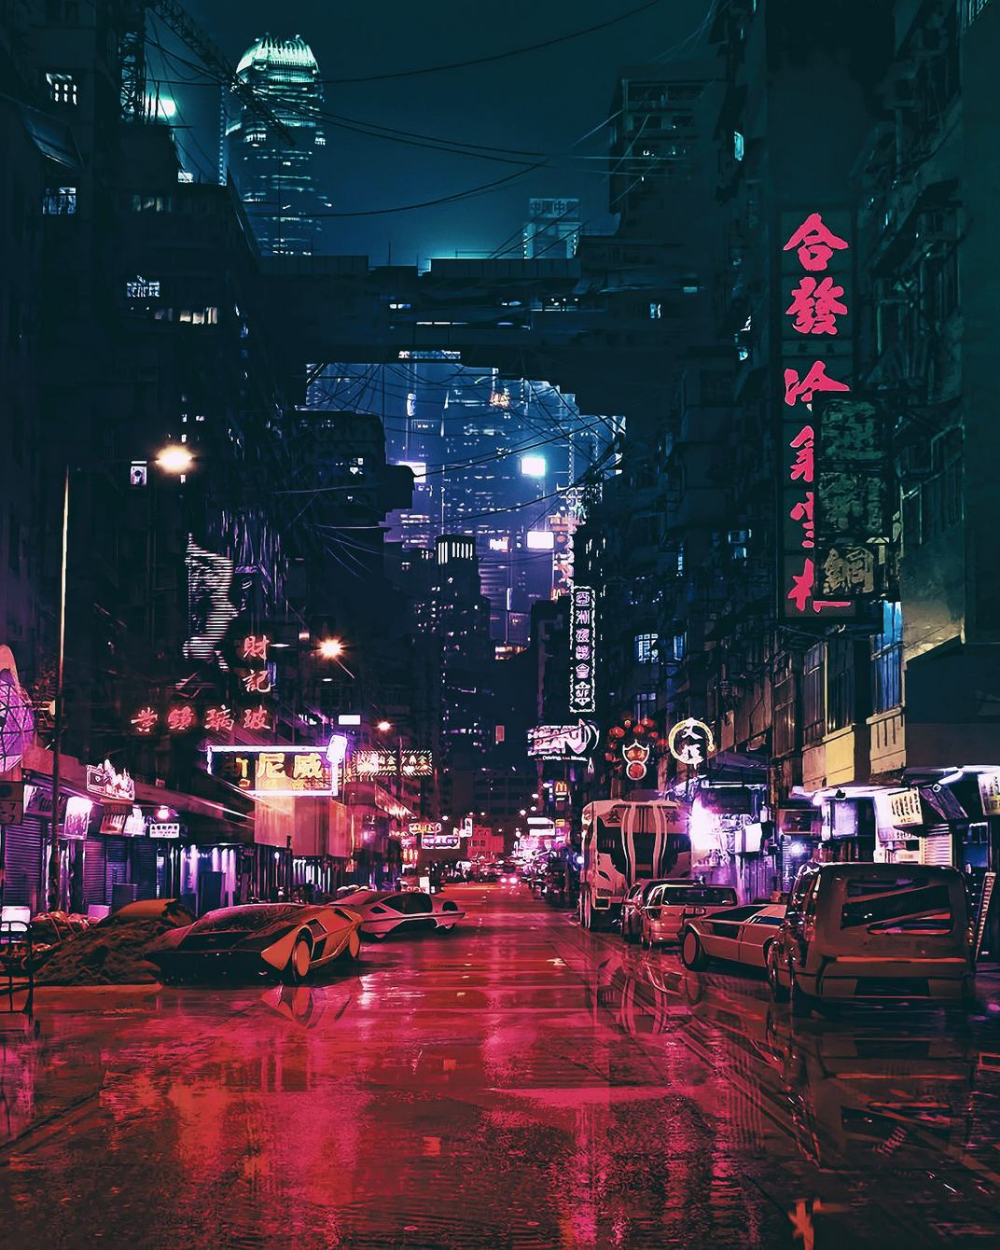 Cyberpunk Futuristic City Science Fiction Concept Art 4k in 2020 1000x1250